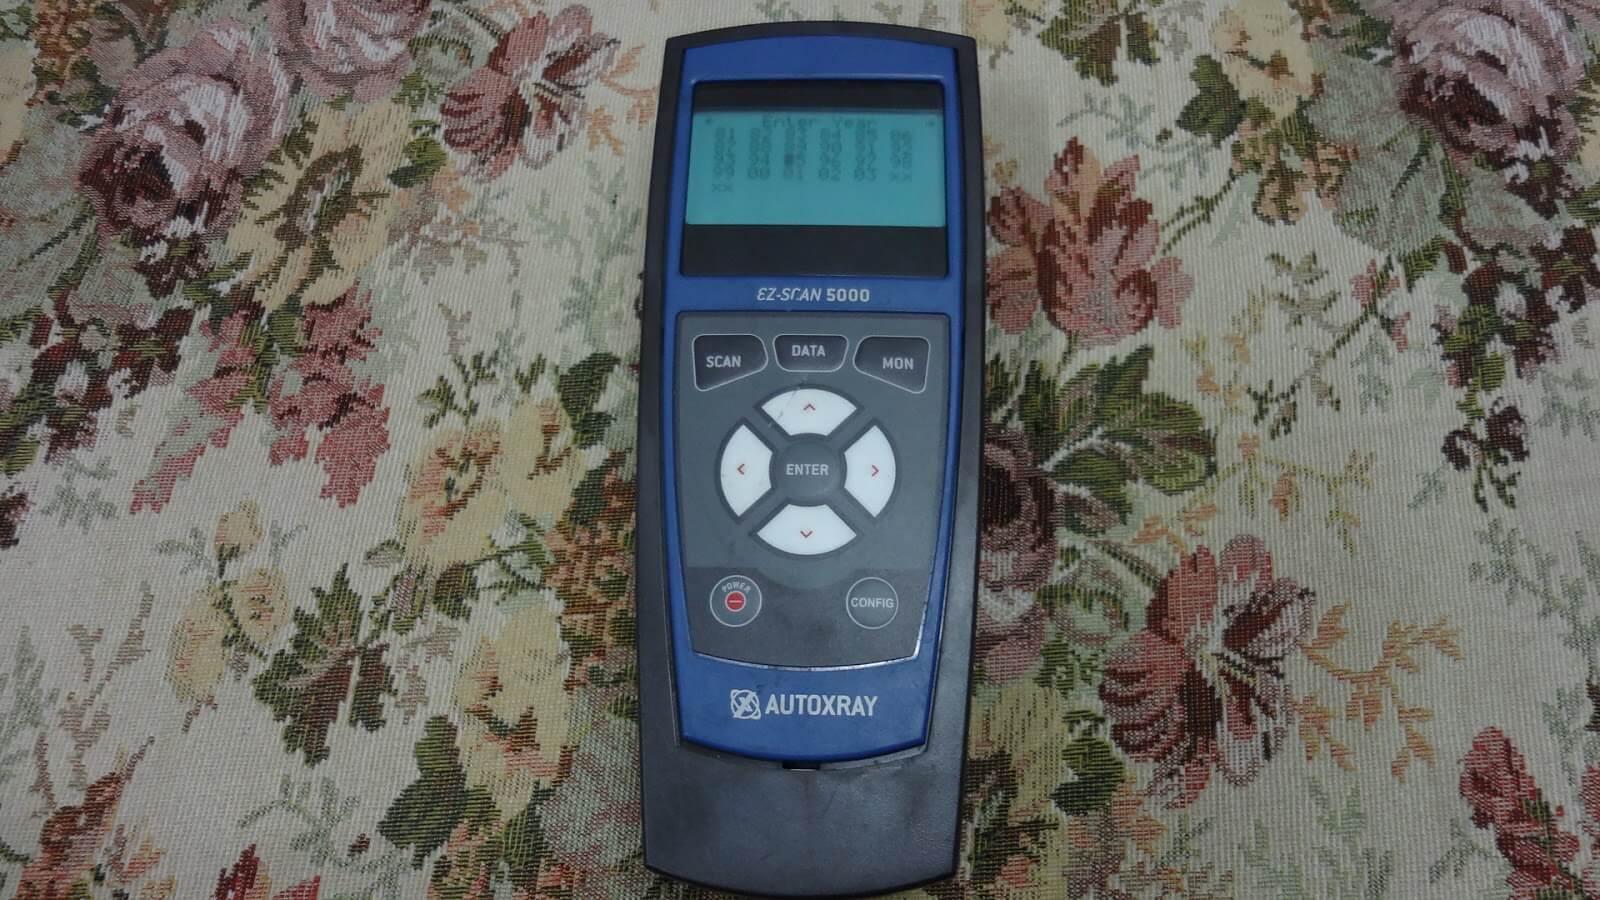 Autoxray 5000 ez obd2 сканер